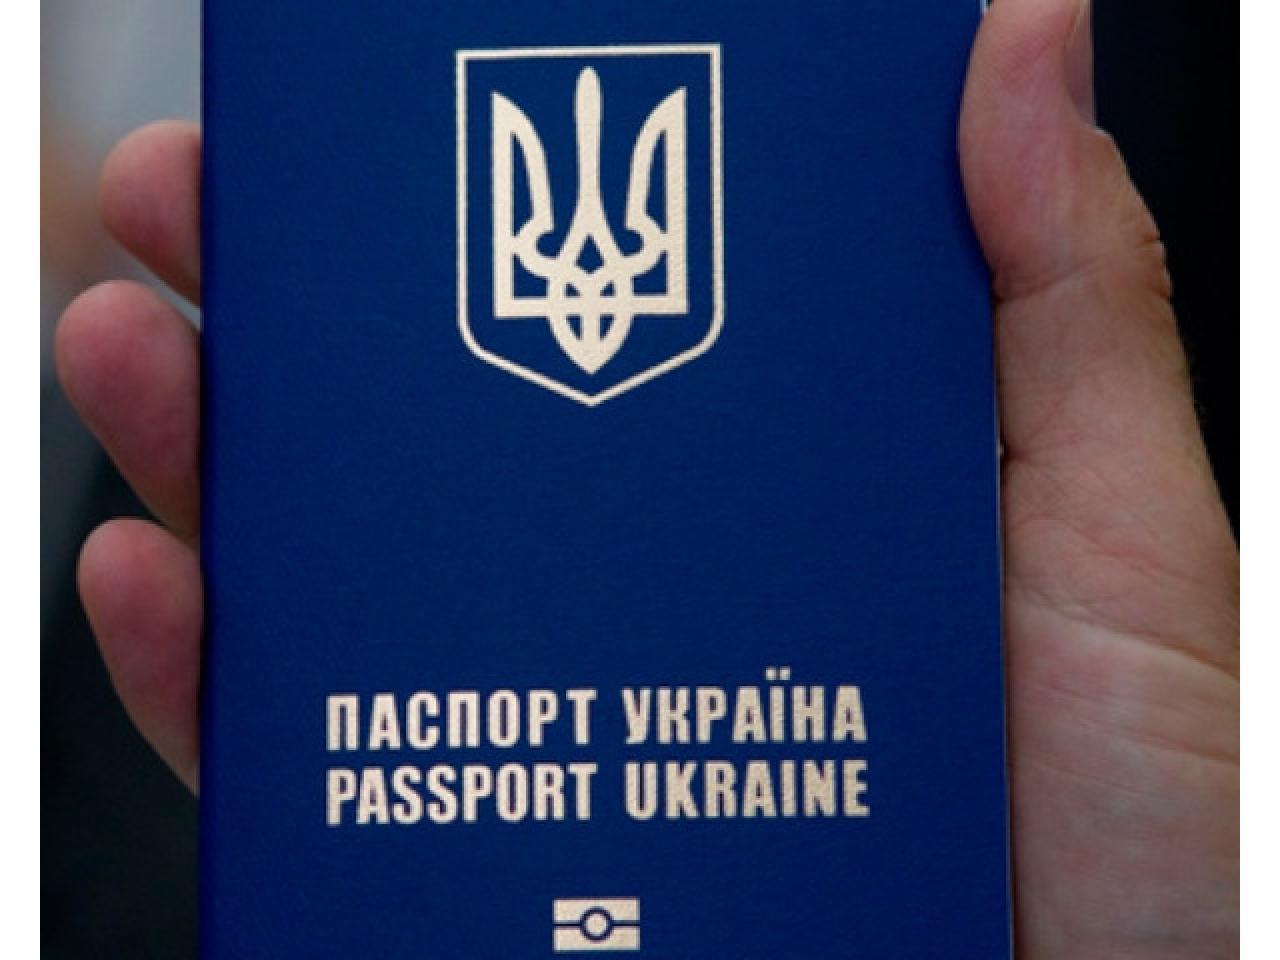 Паспорт Украины, загранпаспорт, купить - 1